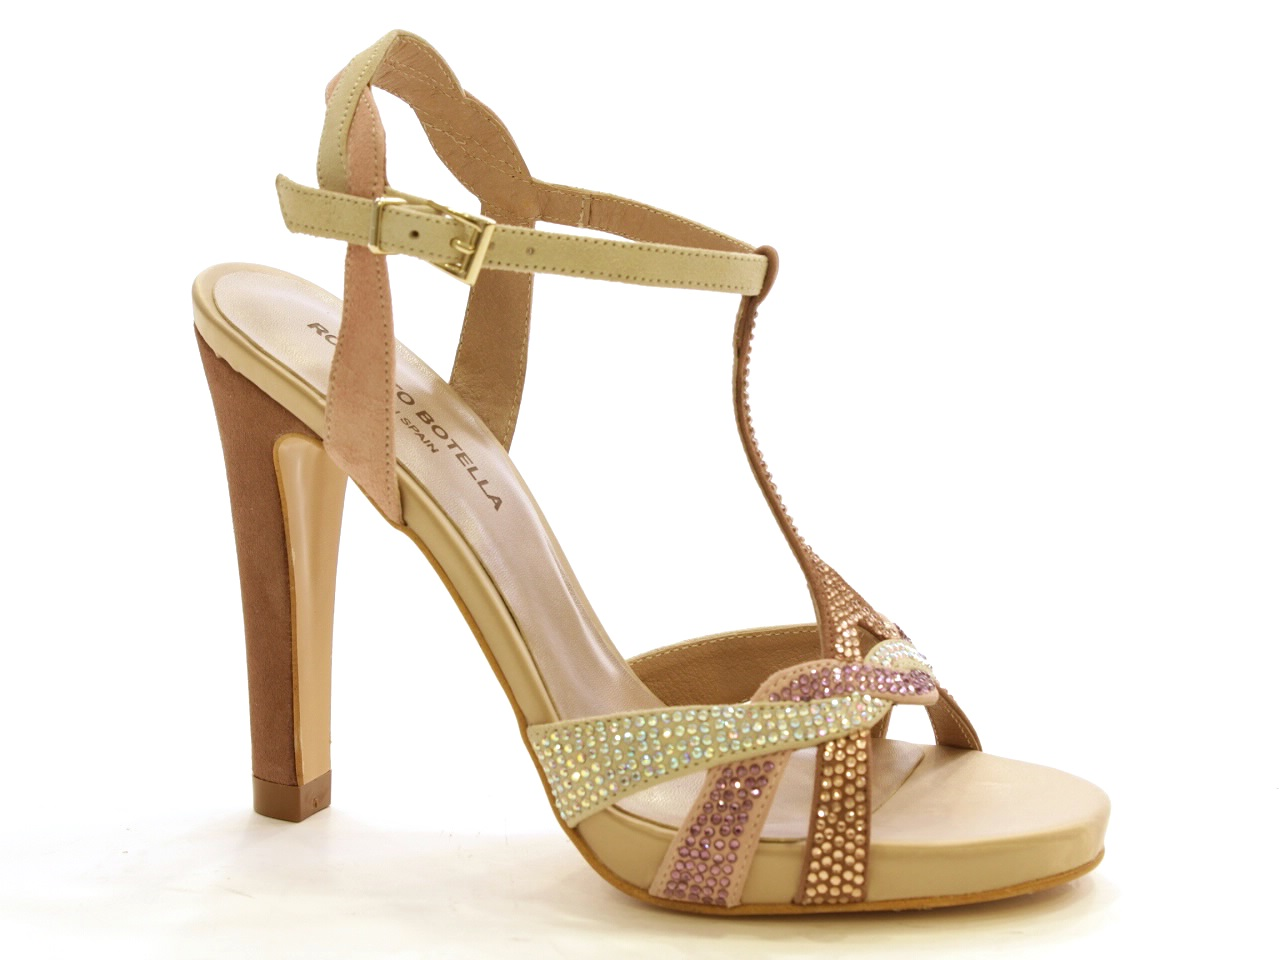 Heel Sandals Roberto Botella - 387 M14412